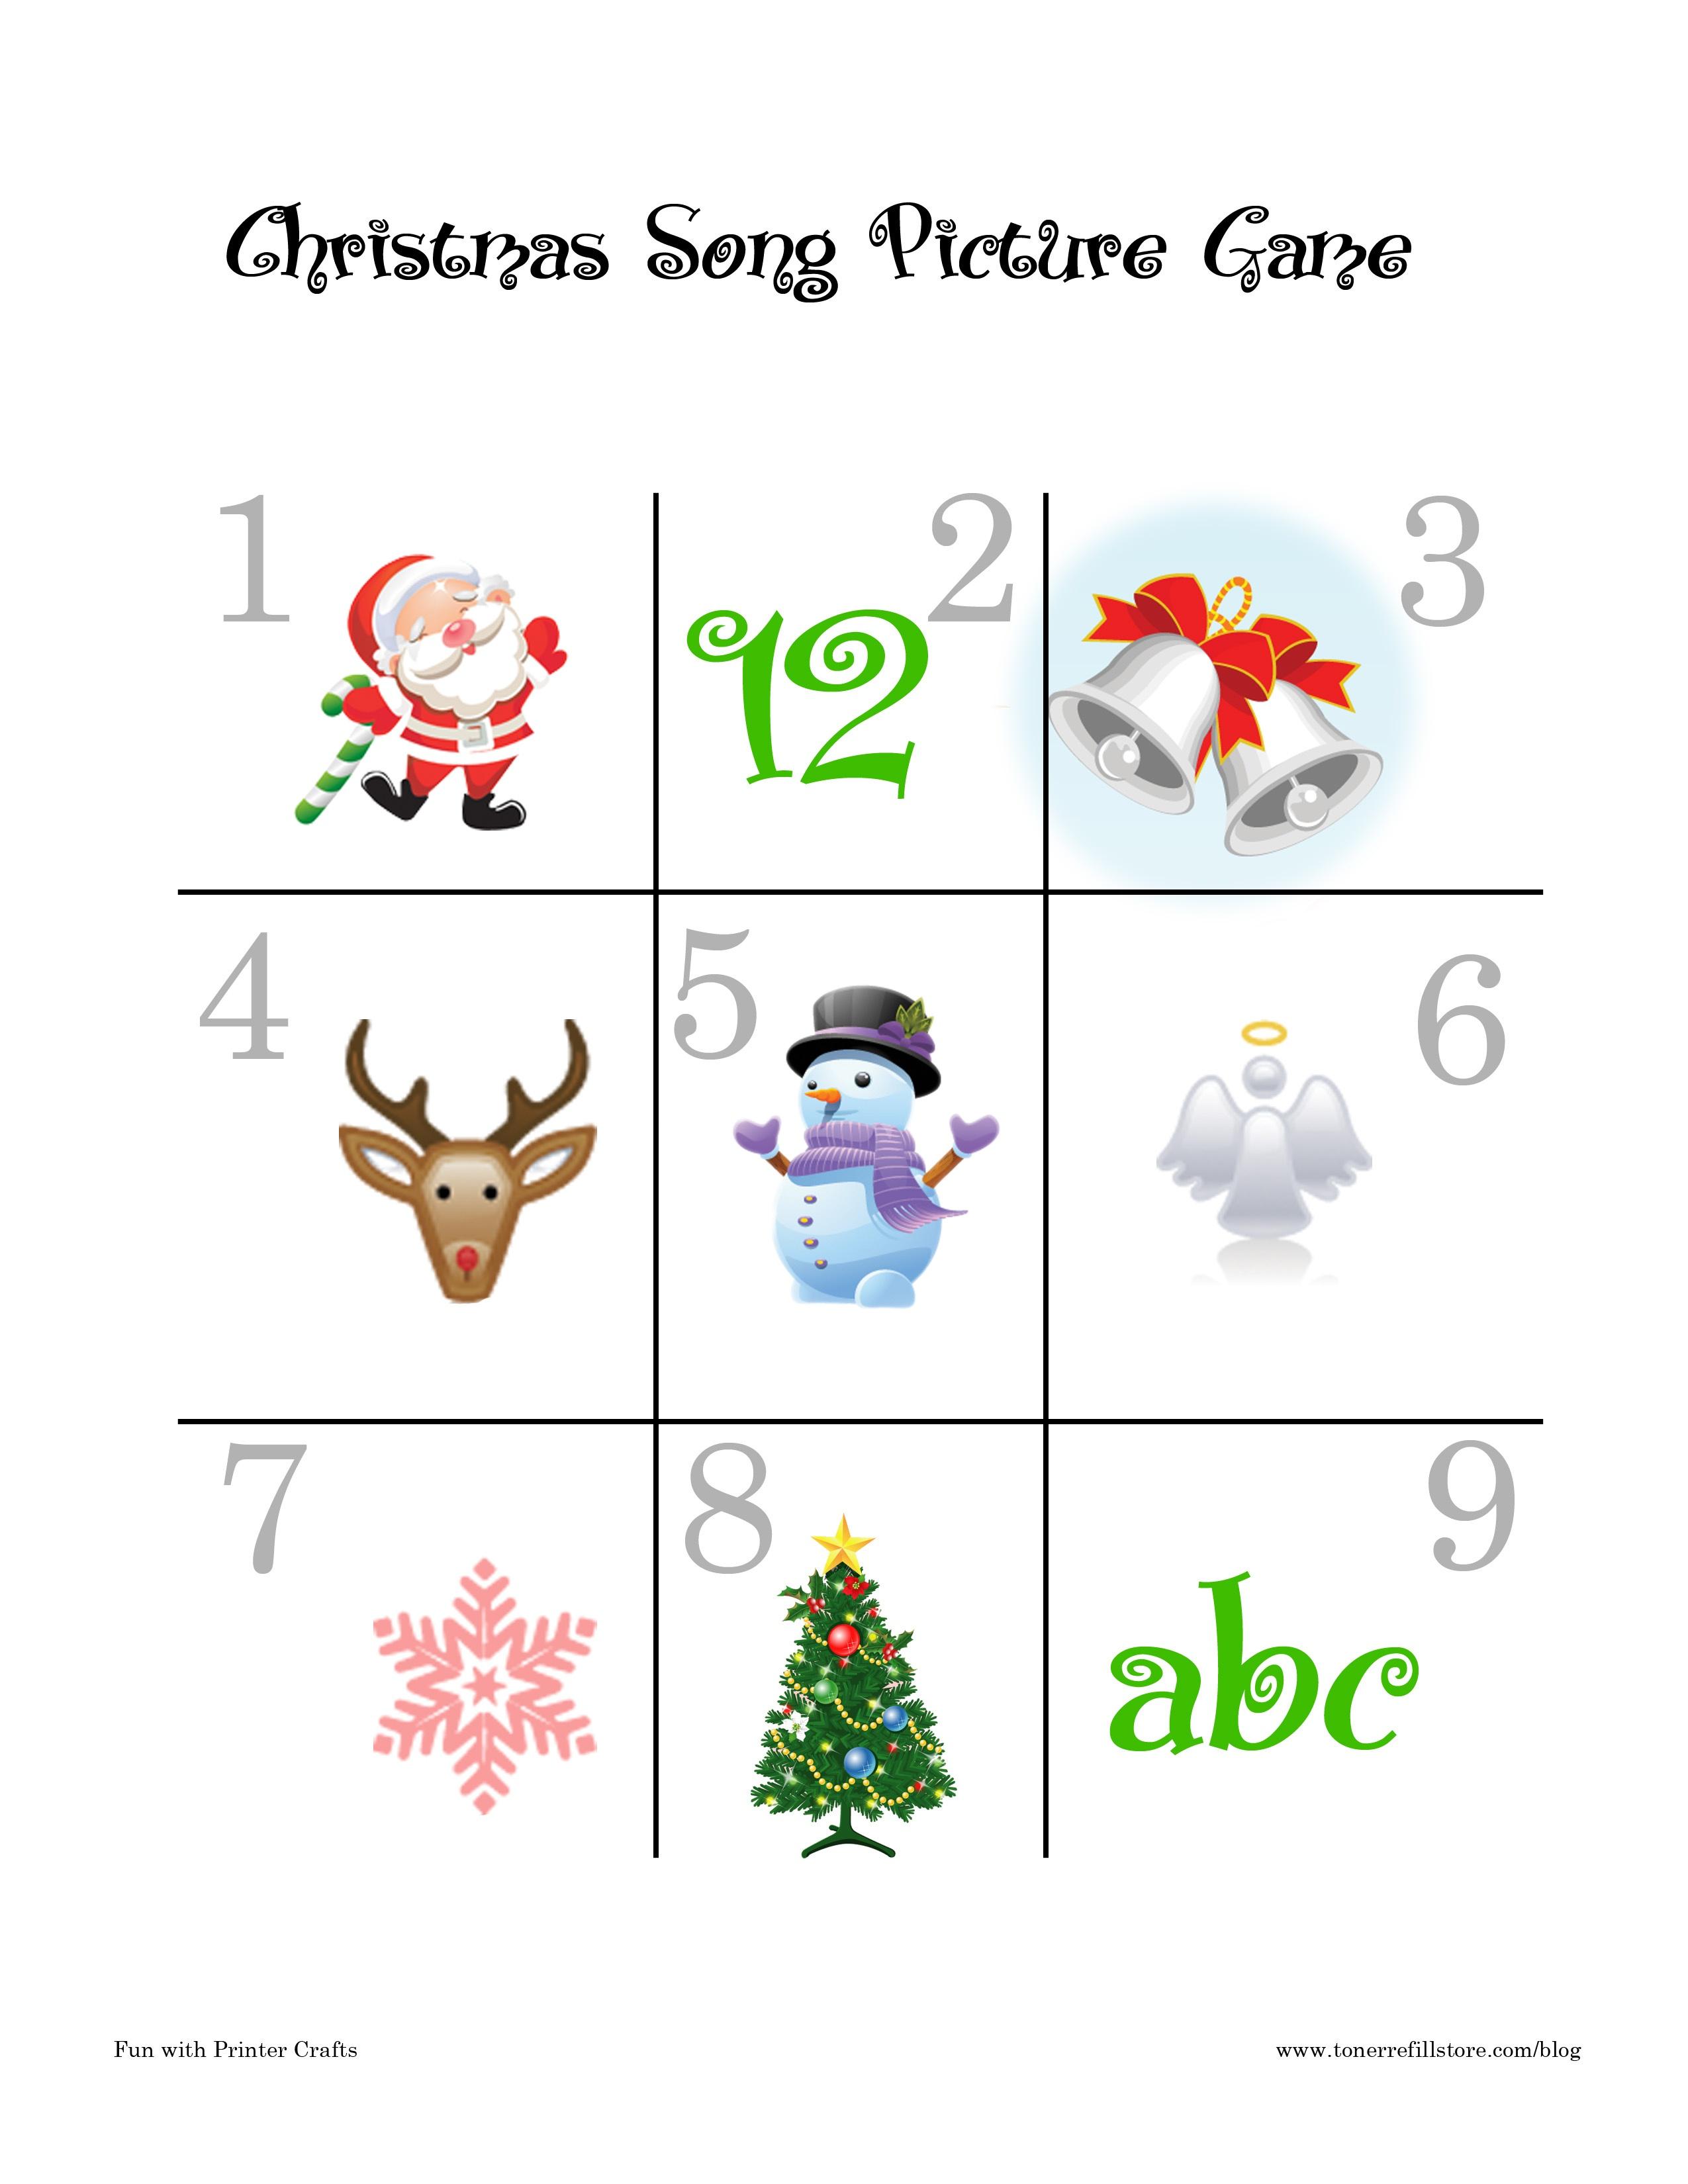 Christmas Song Games : Fun Printable Christmas Games For Kids - Fun - Free Printable Christmas Games For Preschoolers